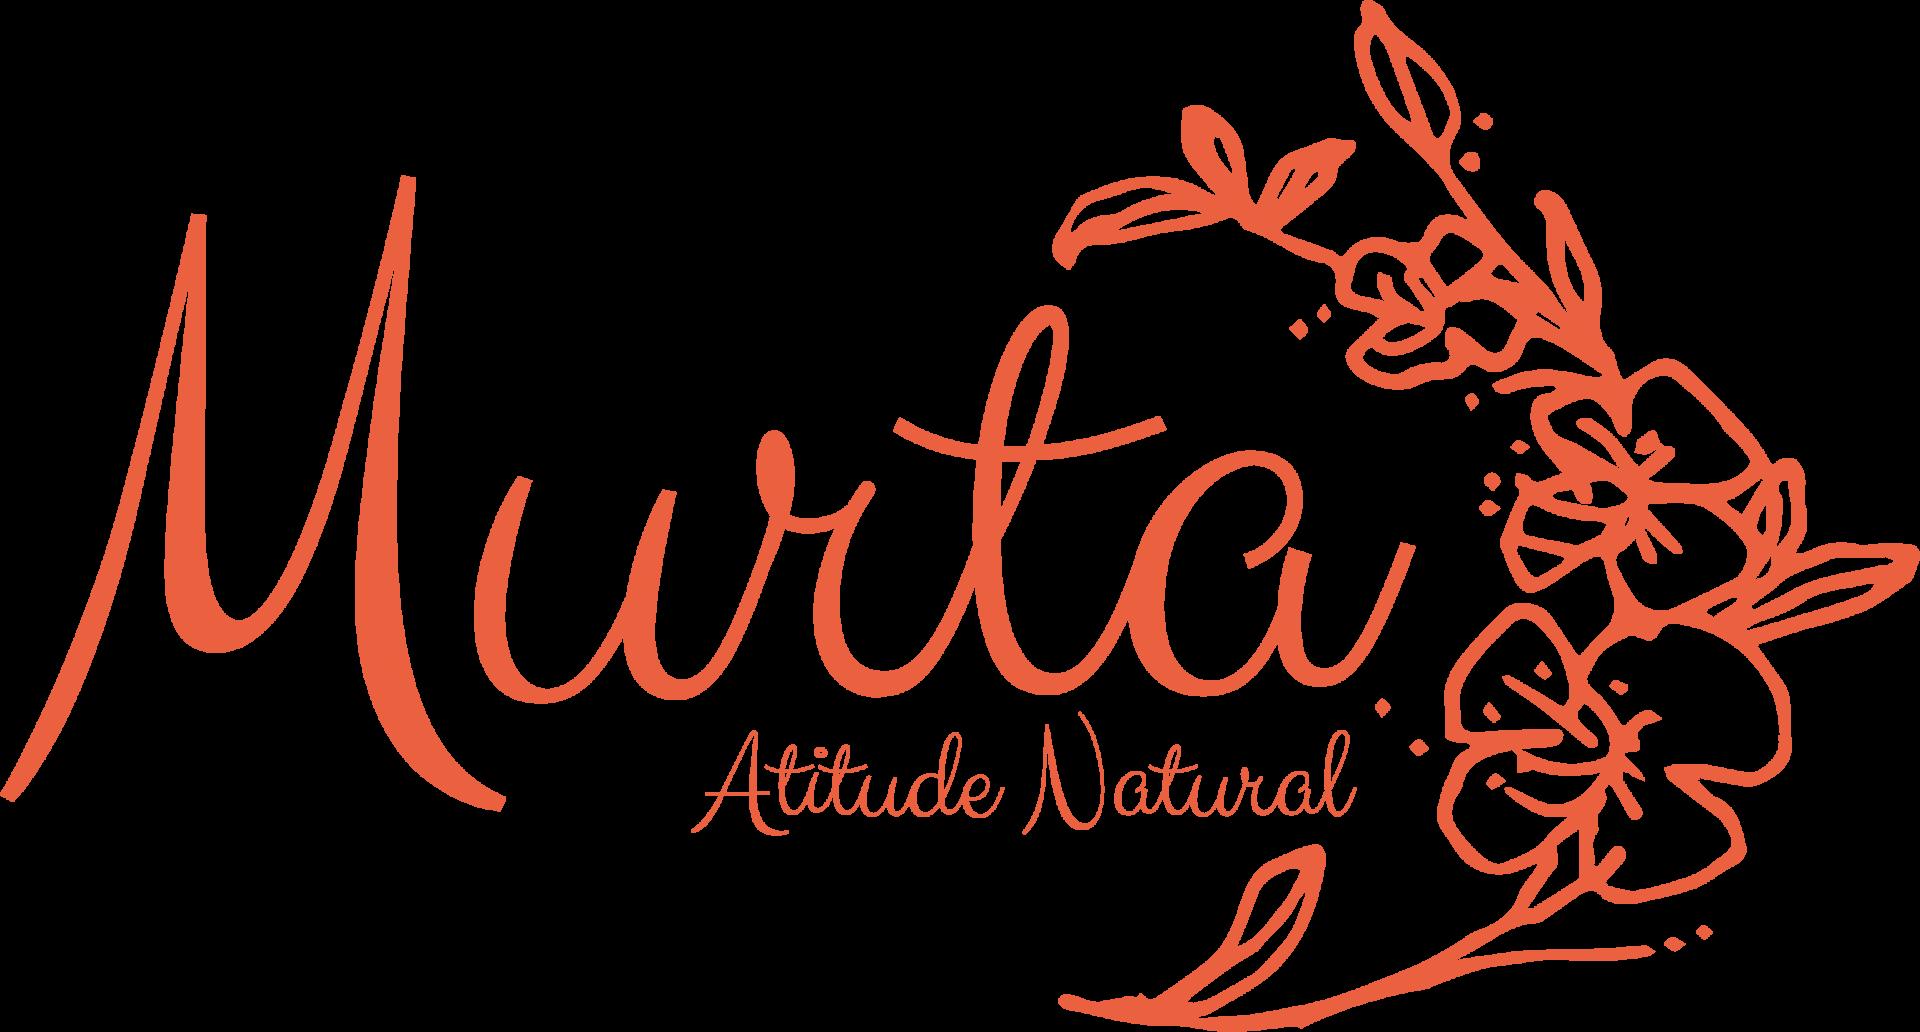 Murta Atitude Natural